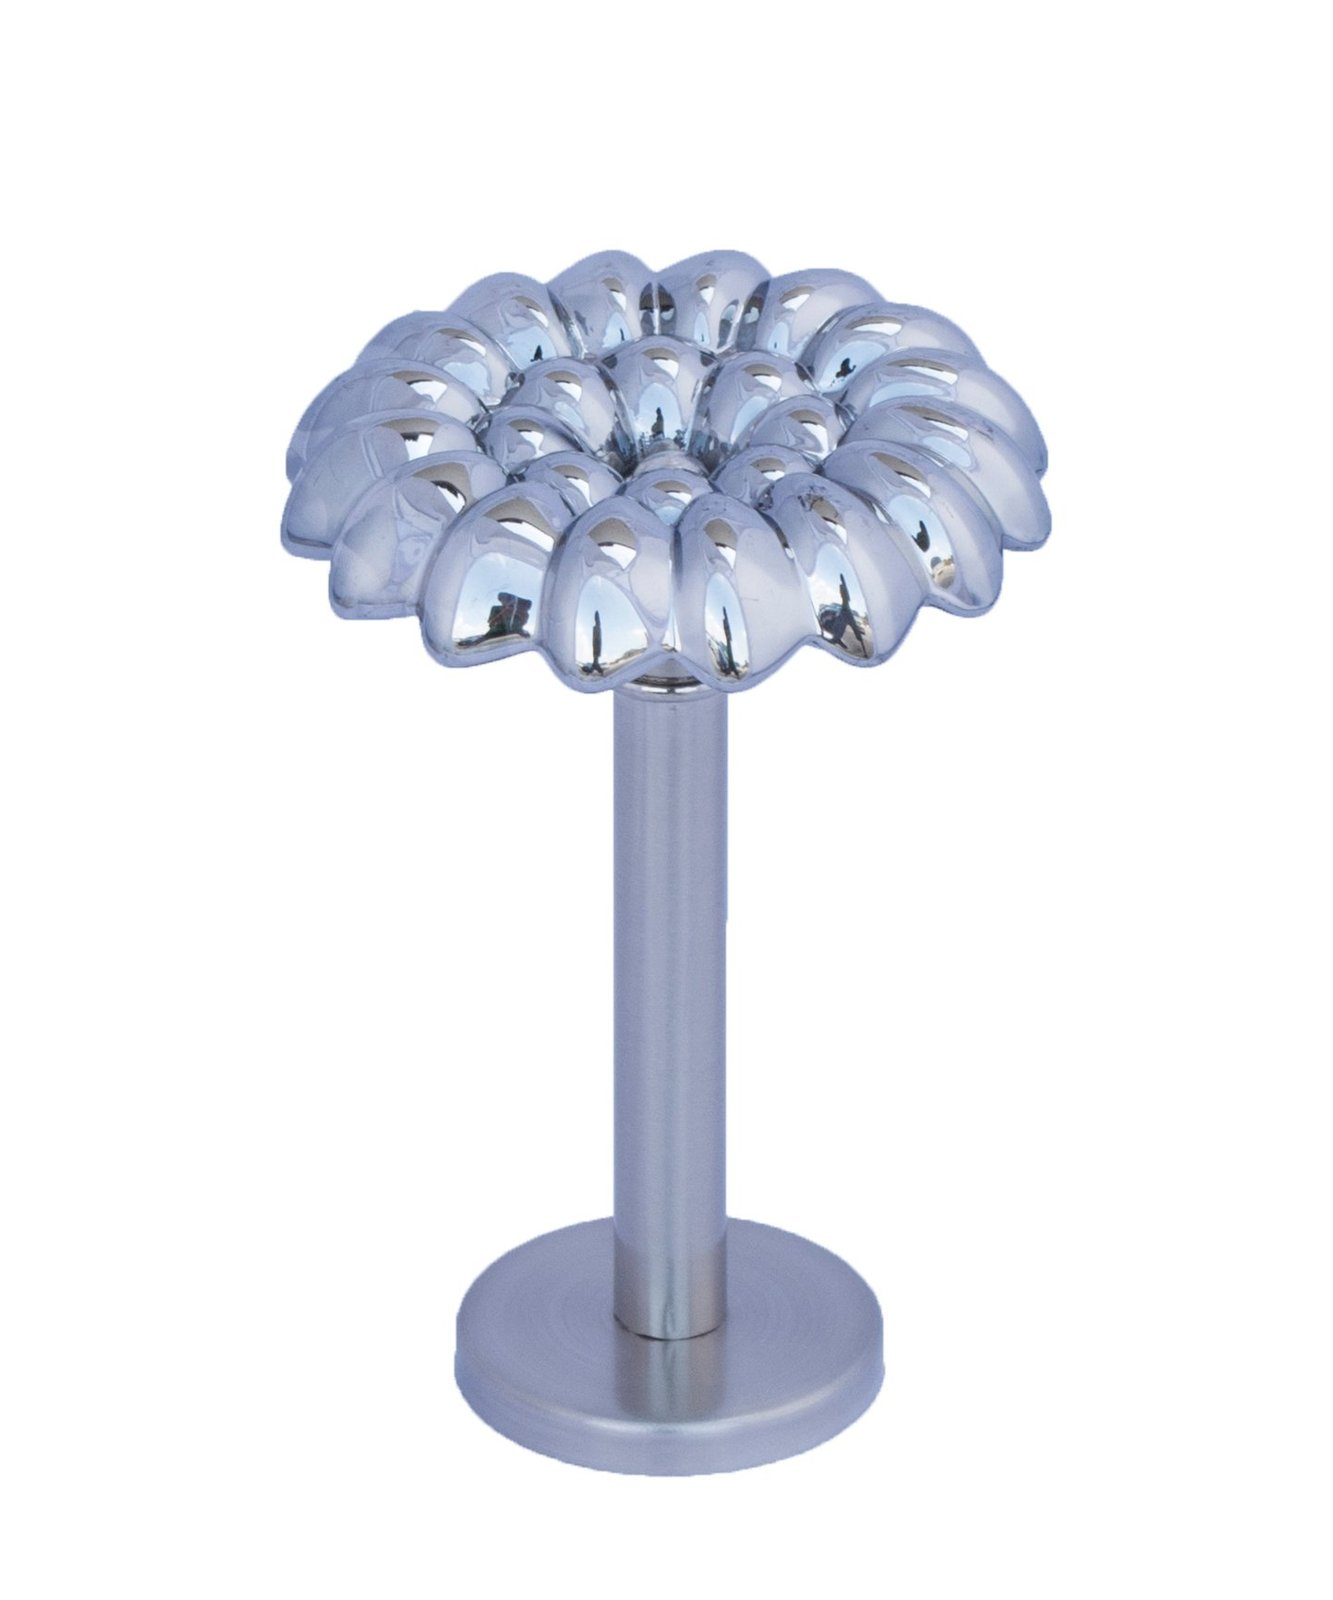 Urbanest Vetro Designer Decor Mercury Glass Drapery Medallion Holdback, 1pcs